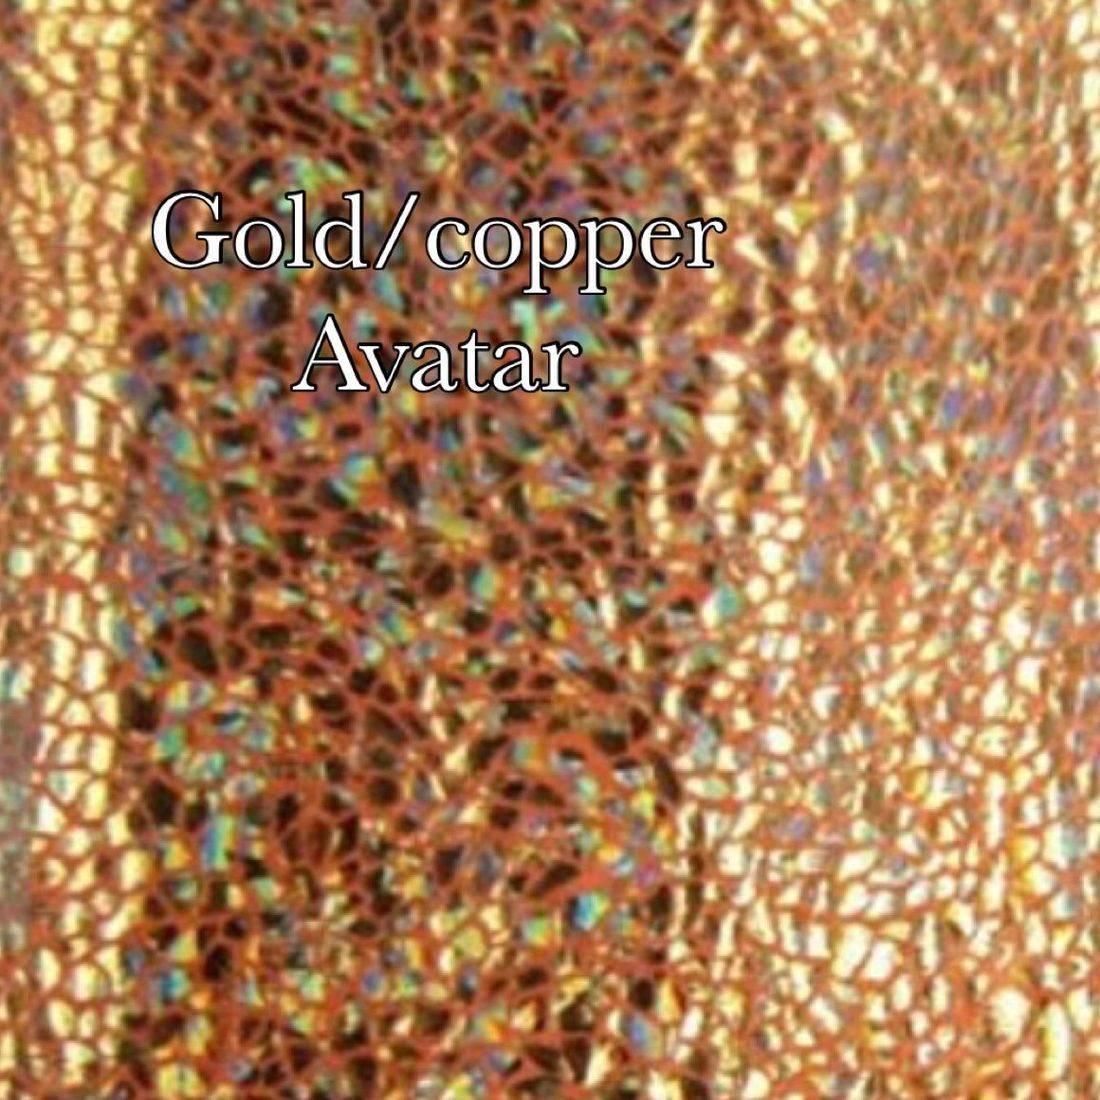 Copper gold avatar